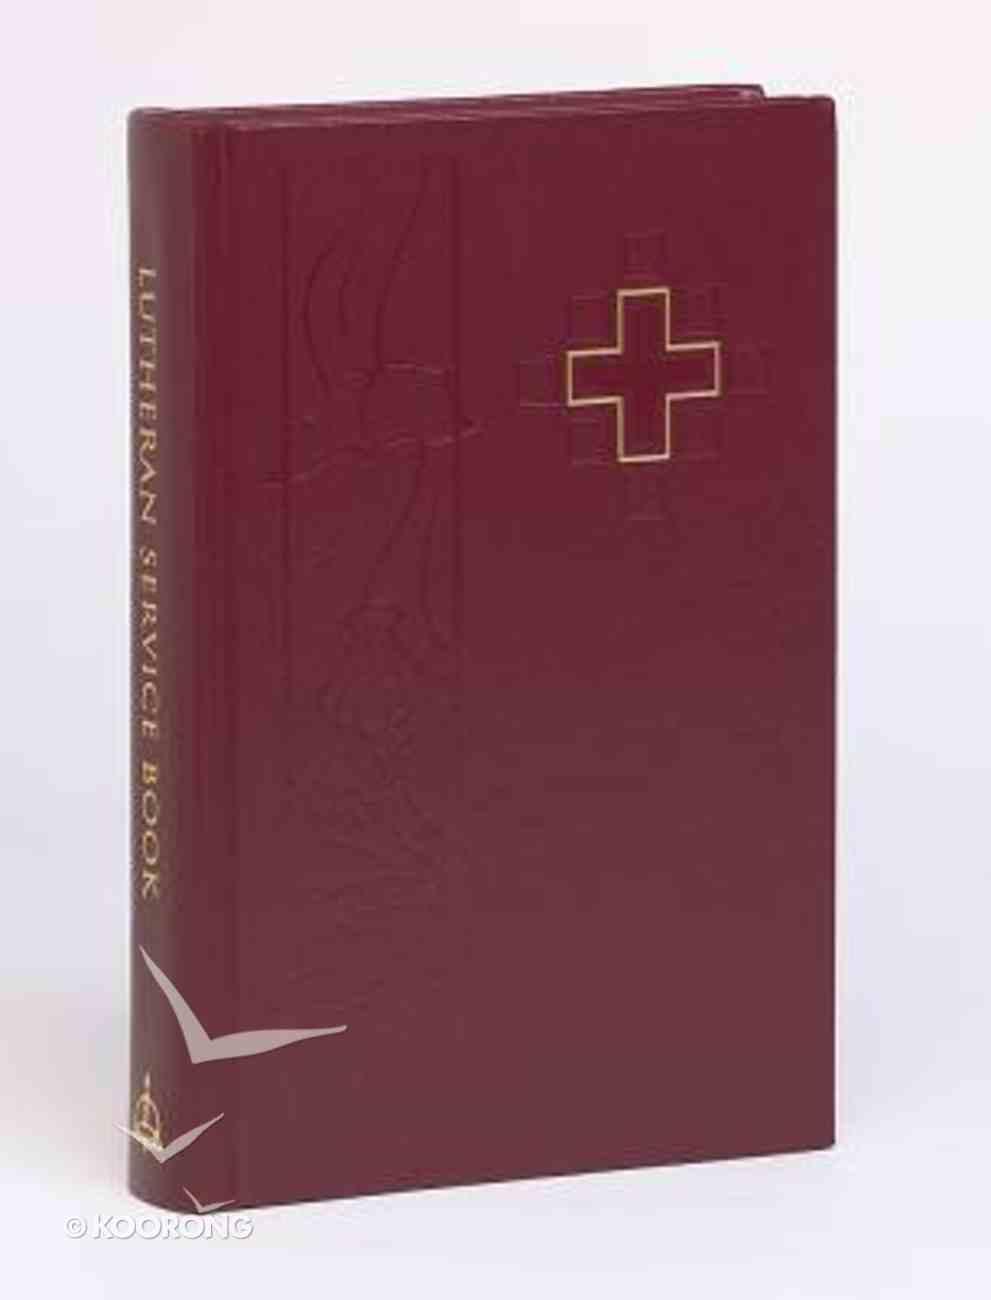 Lutheran Service Book (Pew Edition) Hardback